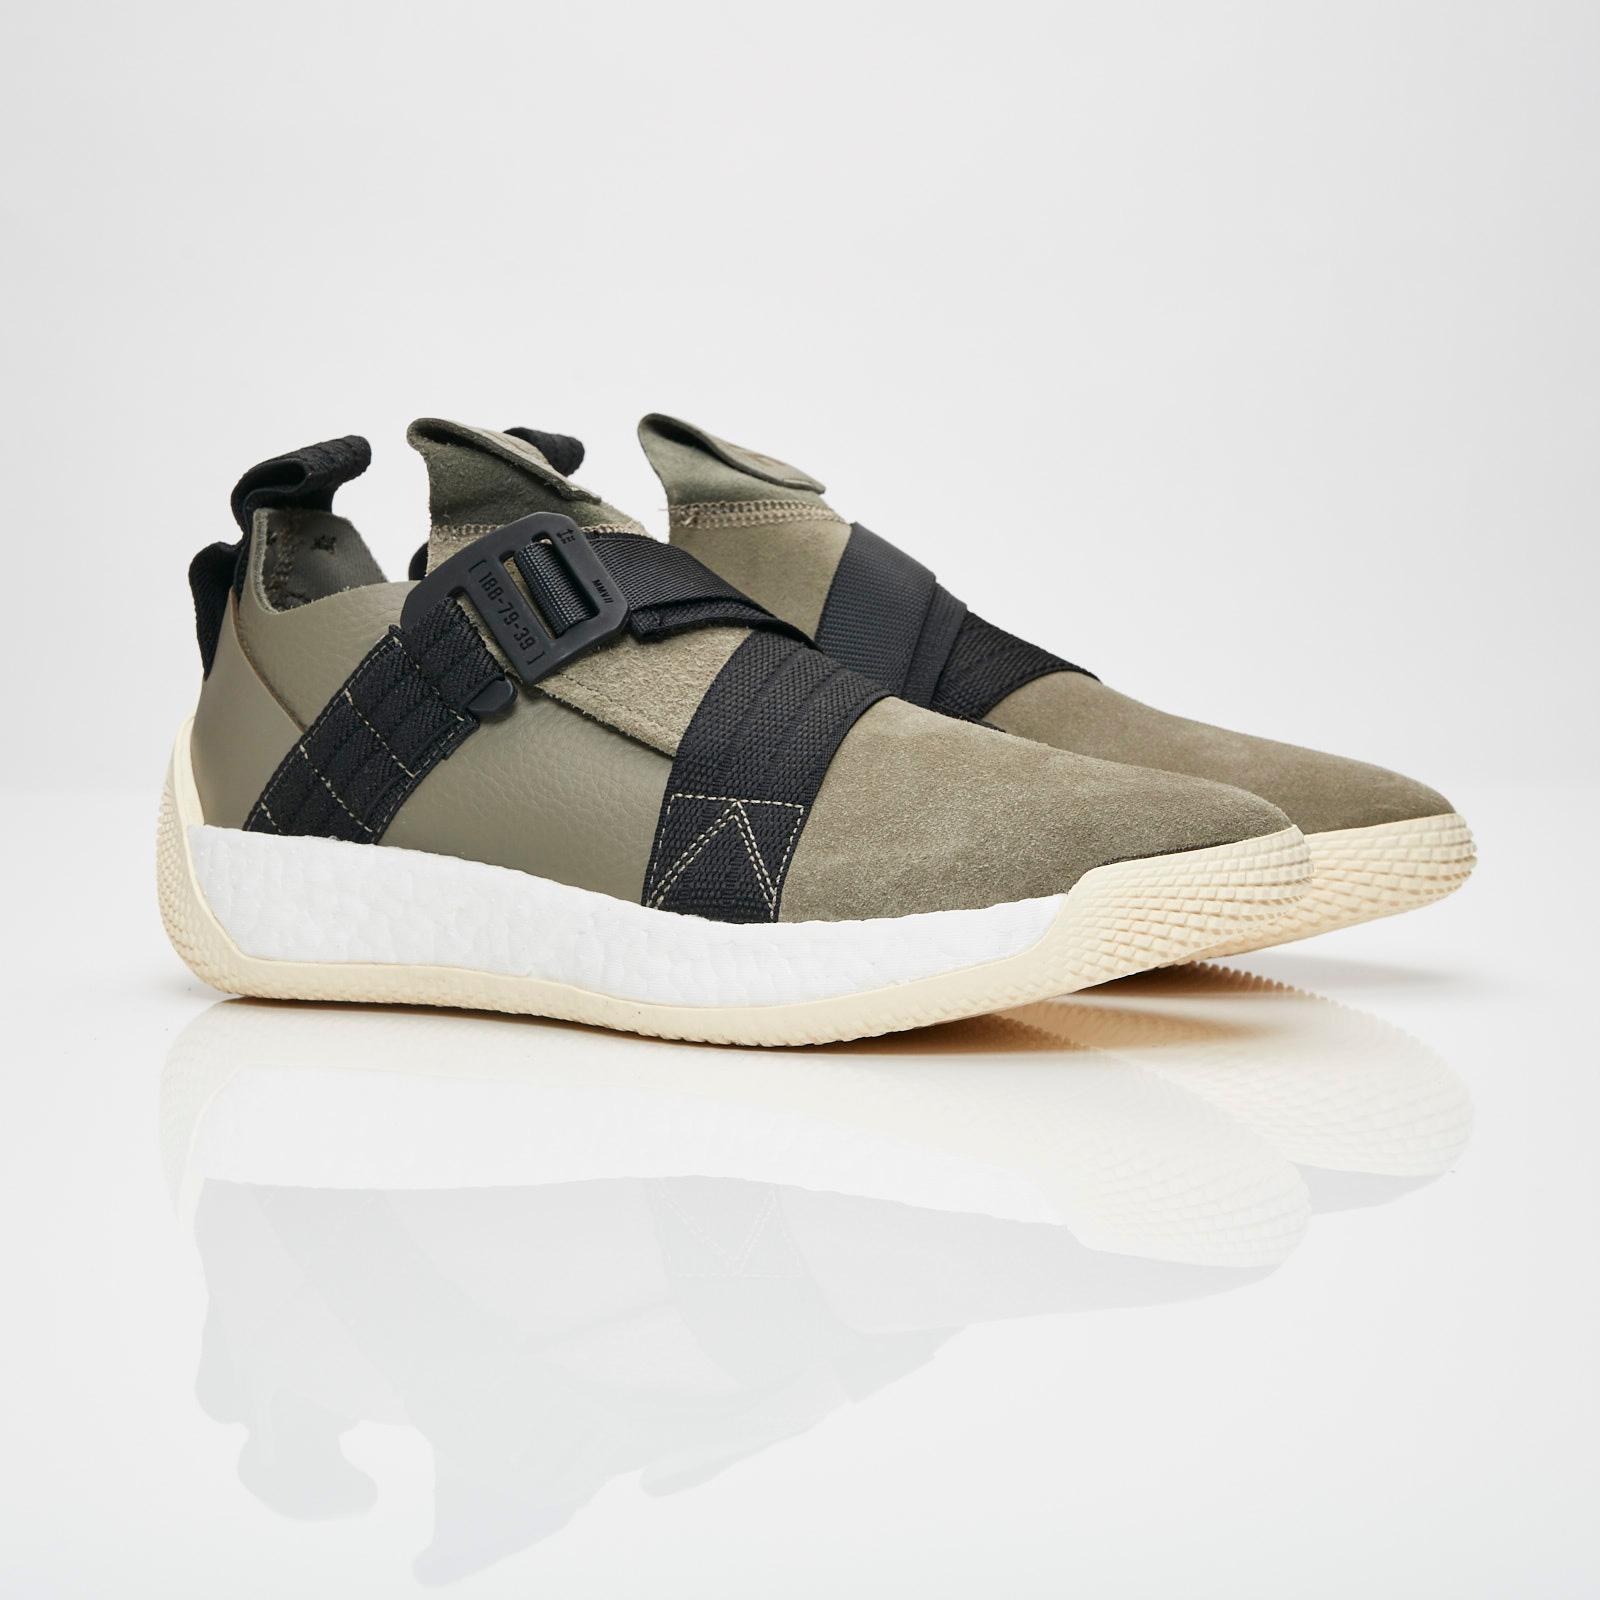 8d64c2bb9b62 adidas Harden LS 2 Buckle - Aq0020 - Sneakersnstuff